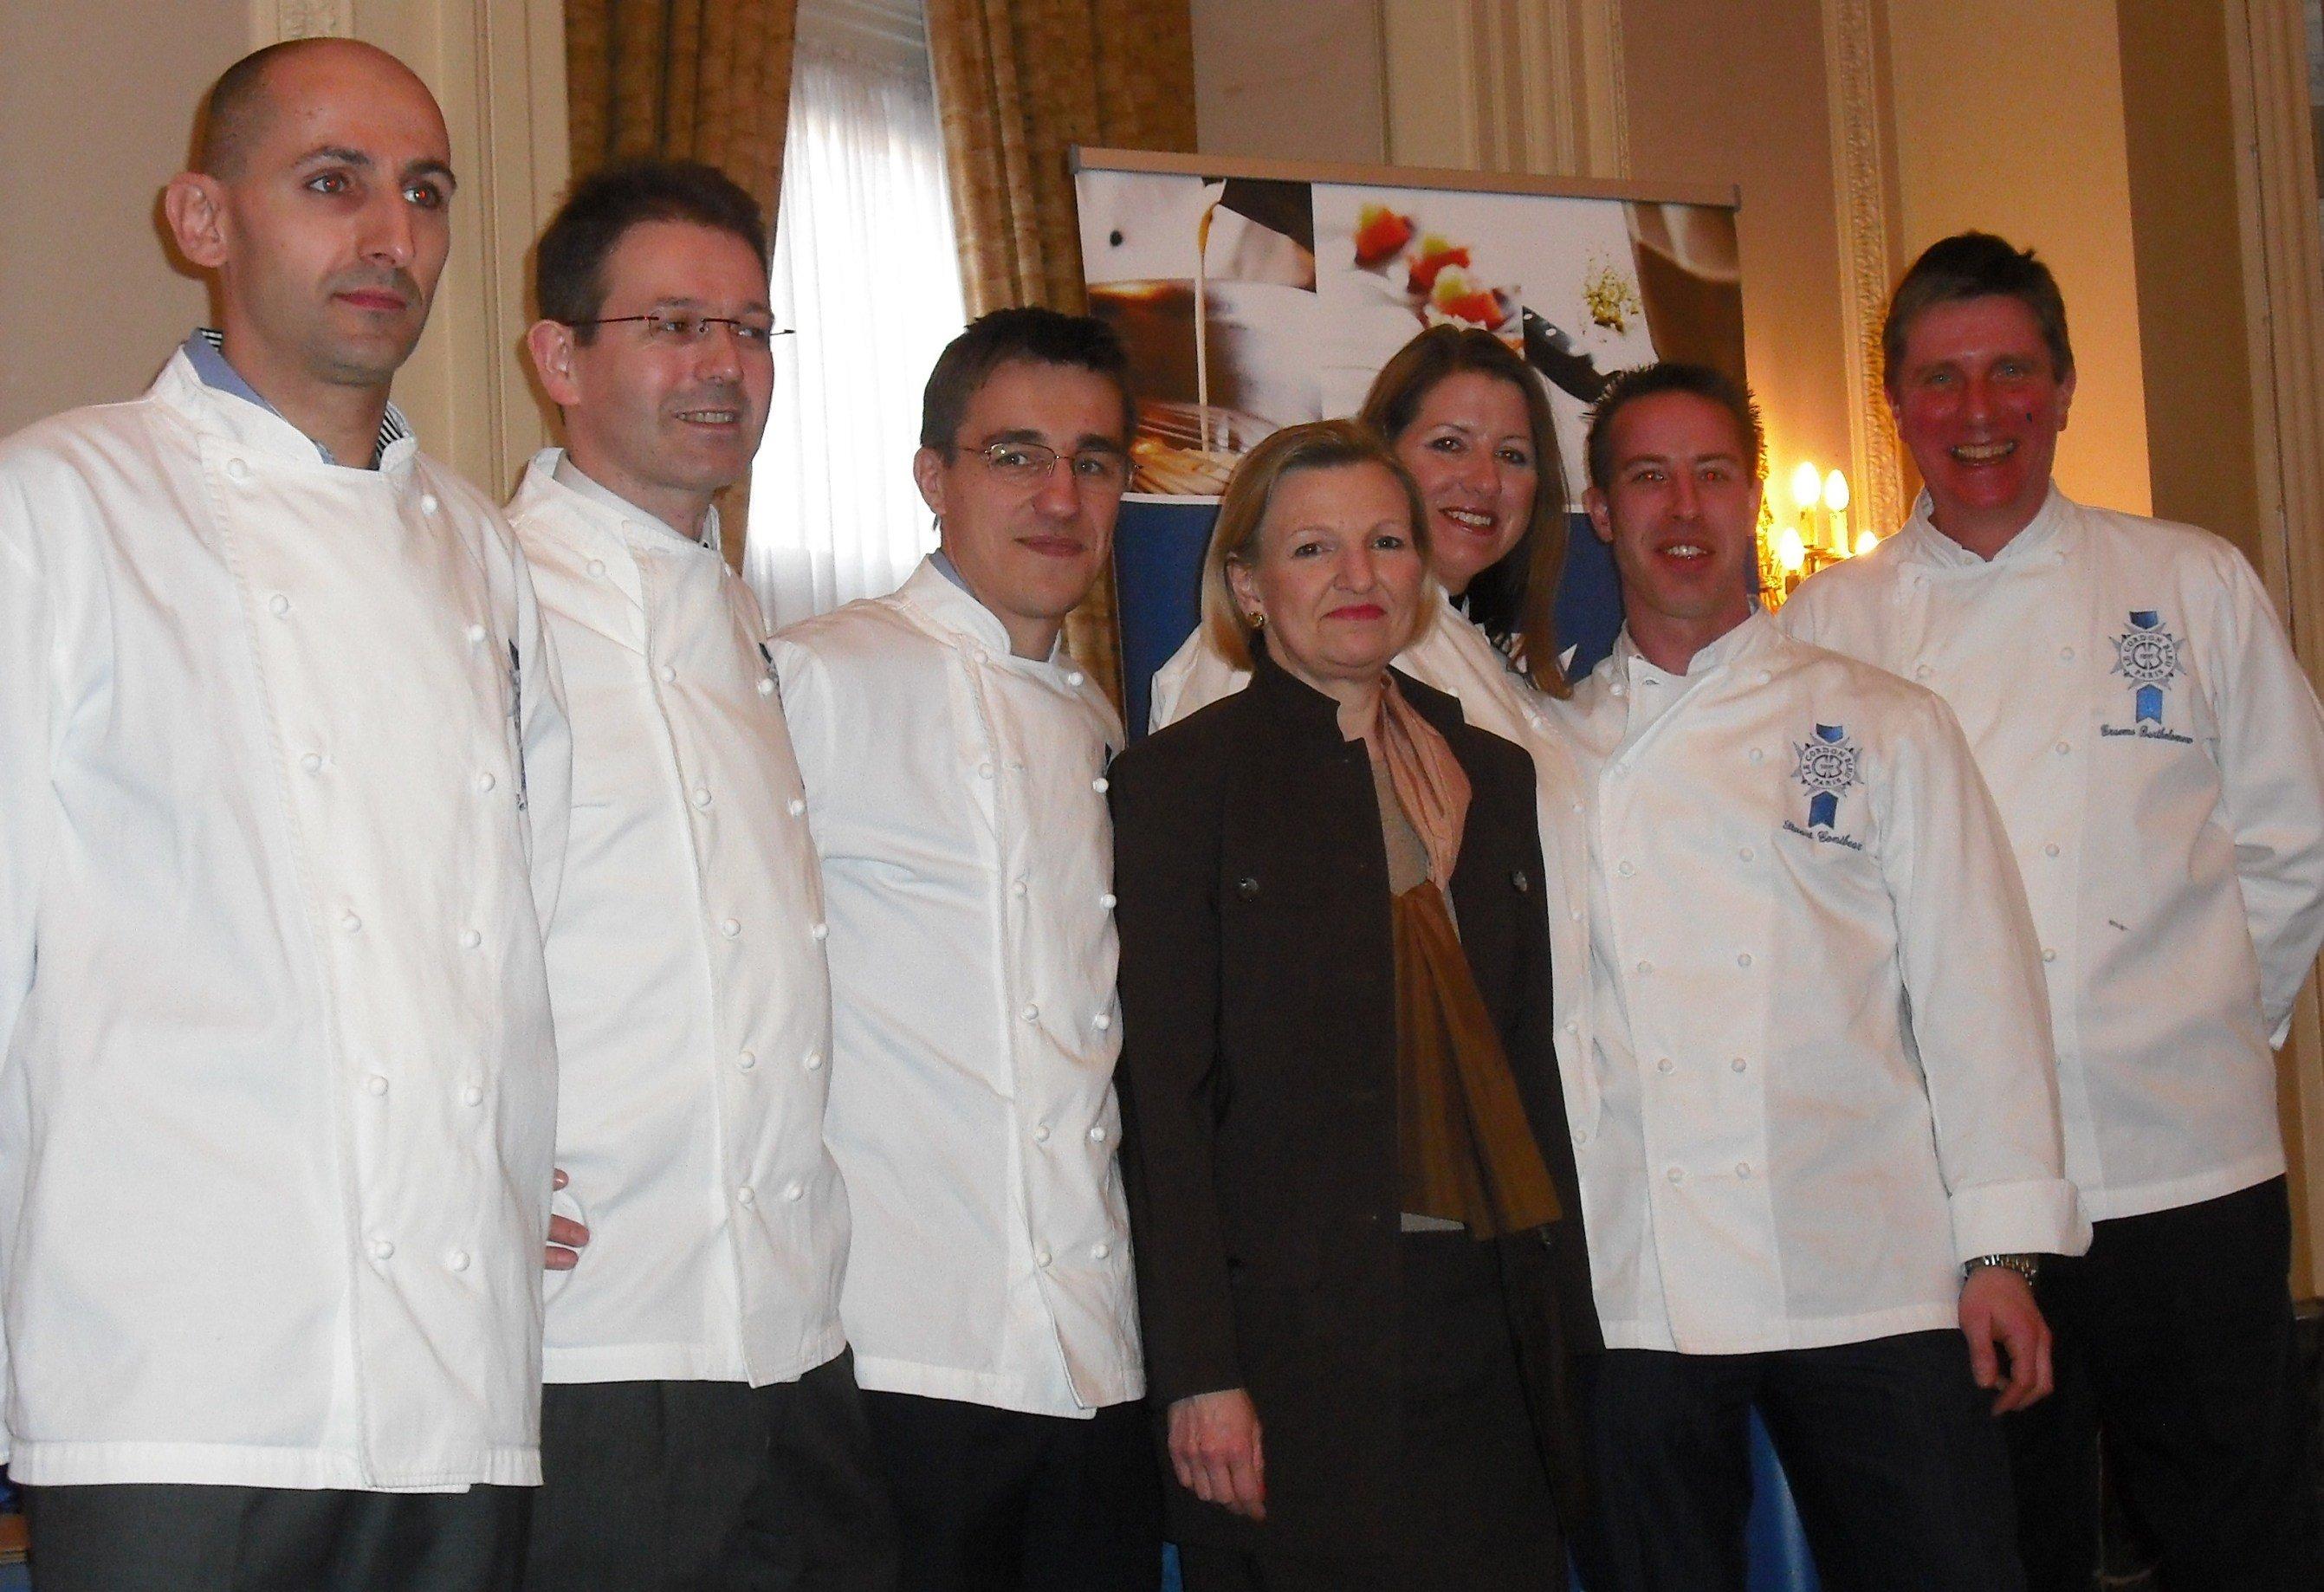 Le Cordon Bleu London chefs and Principal, Ms Lesley Gray